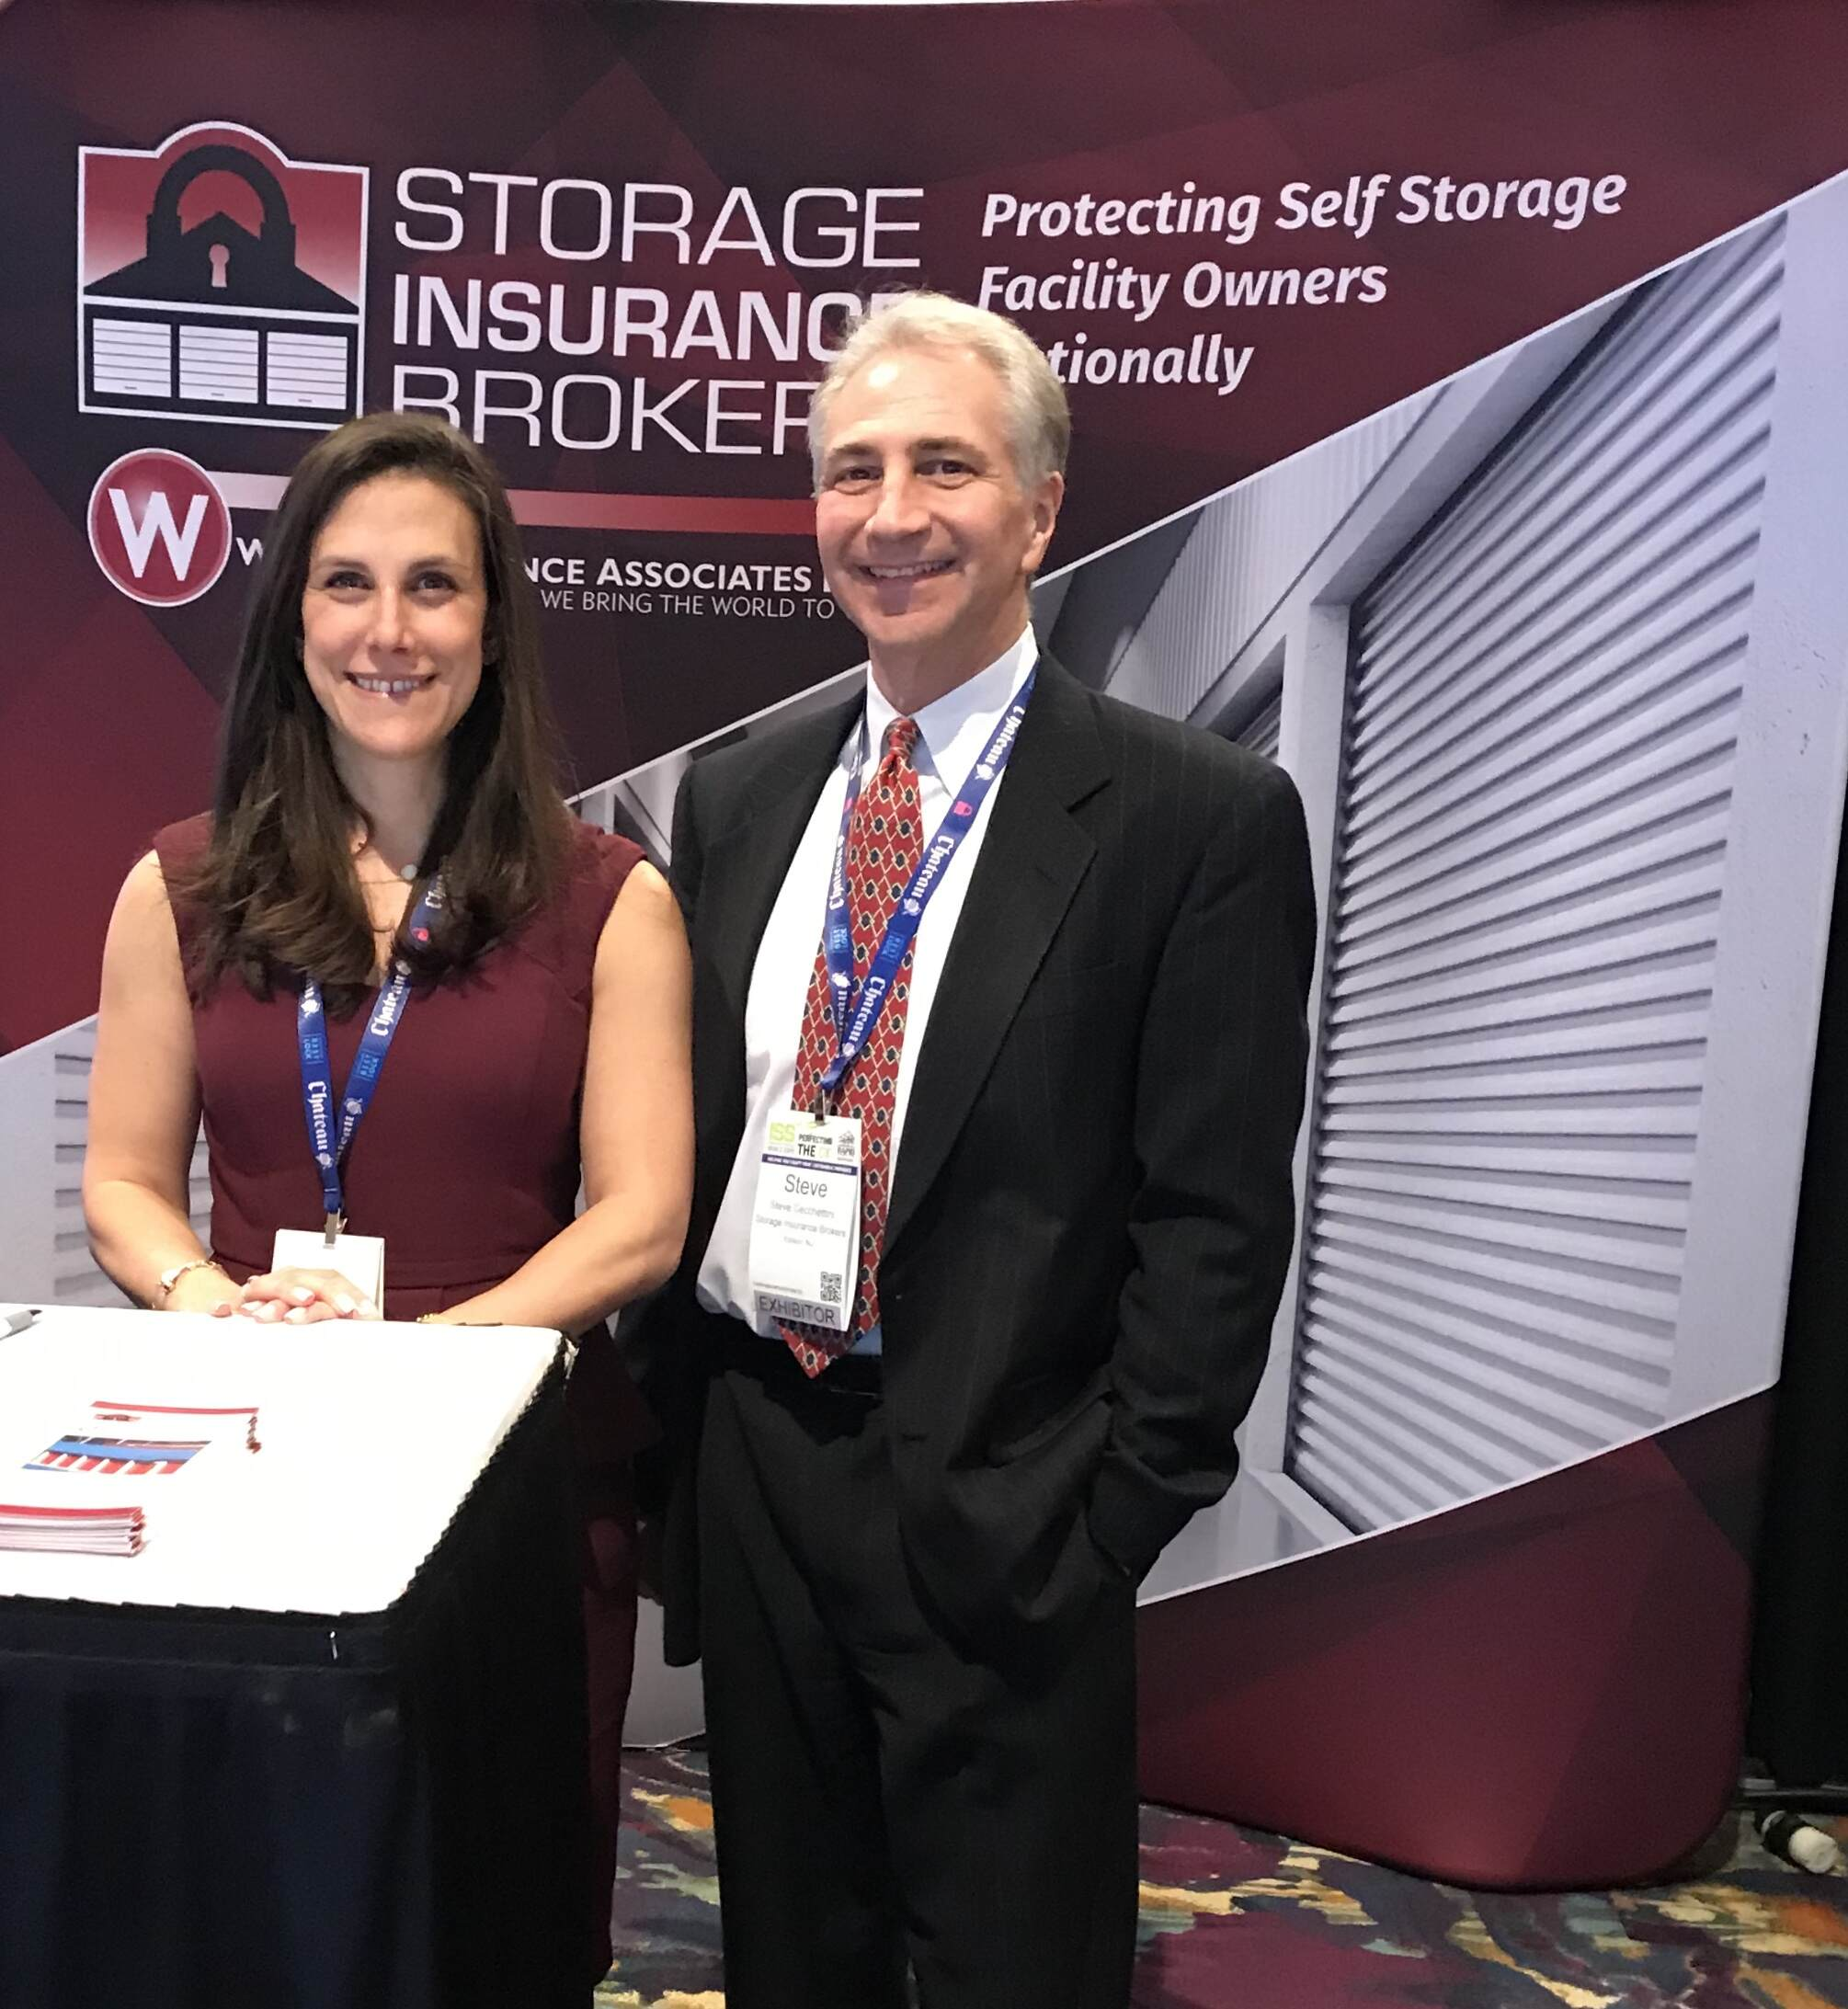 2019 Inside Self Storage World Expo